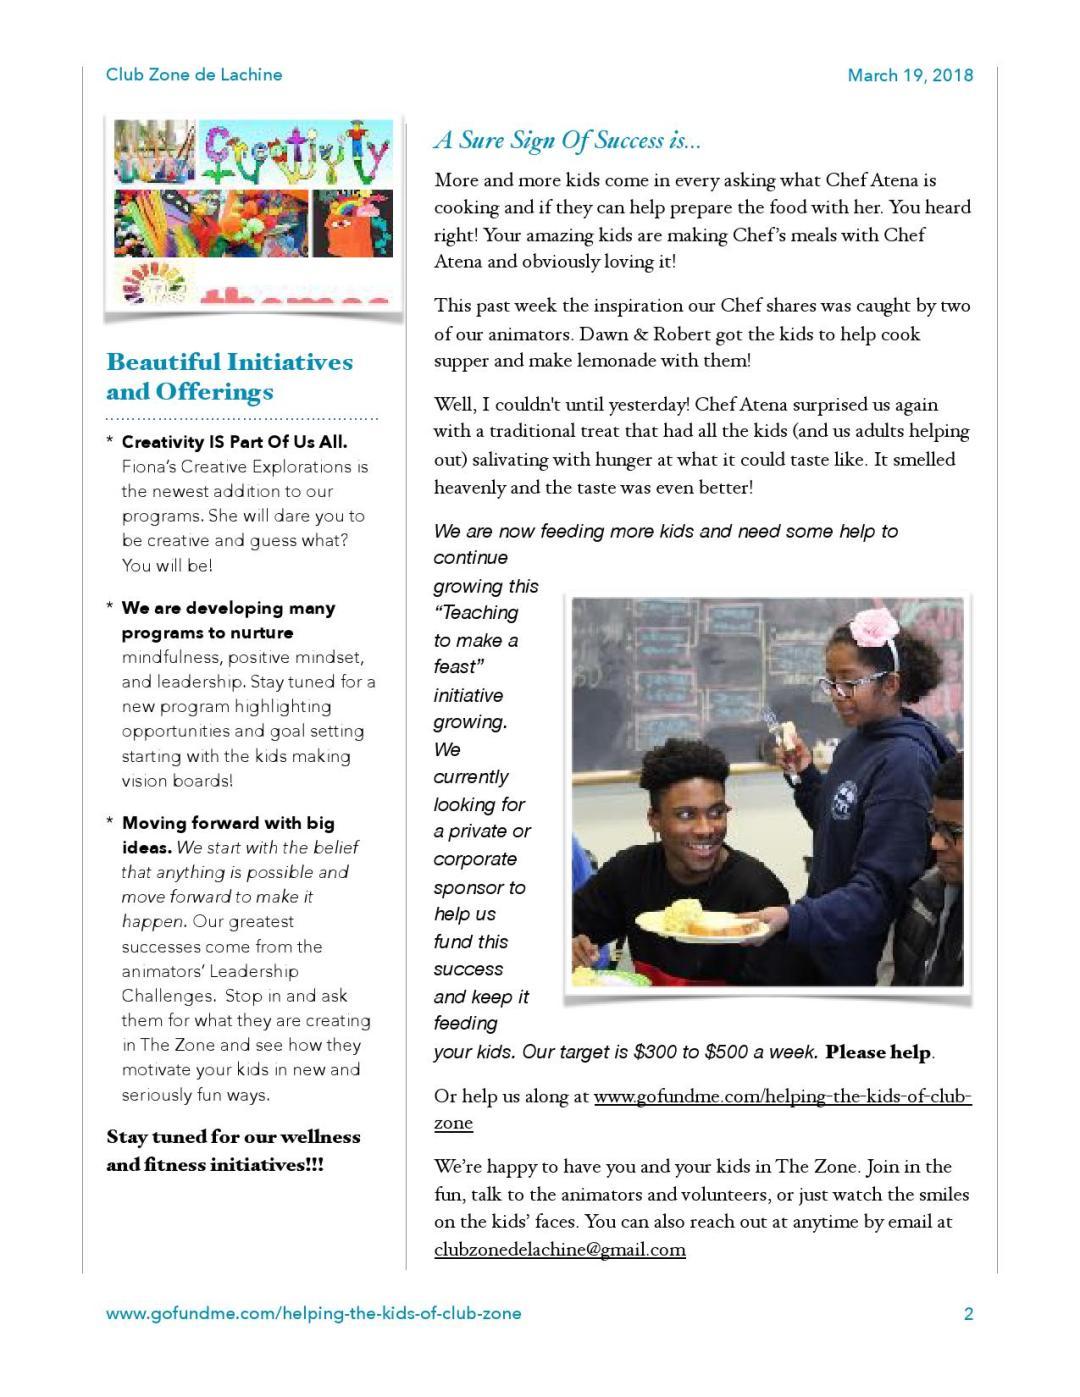 Club Zone Newsletter 2018-03-19_2